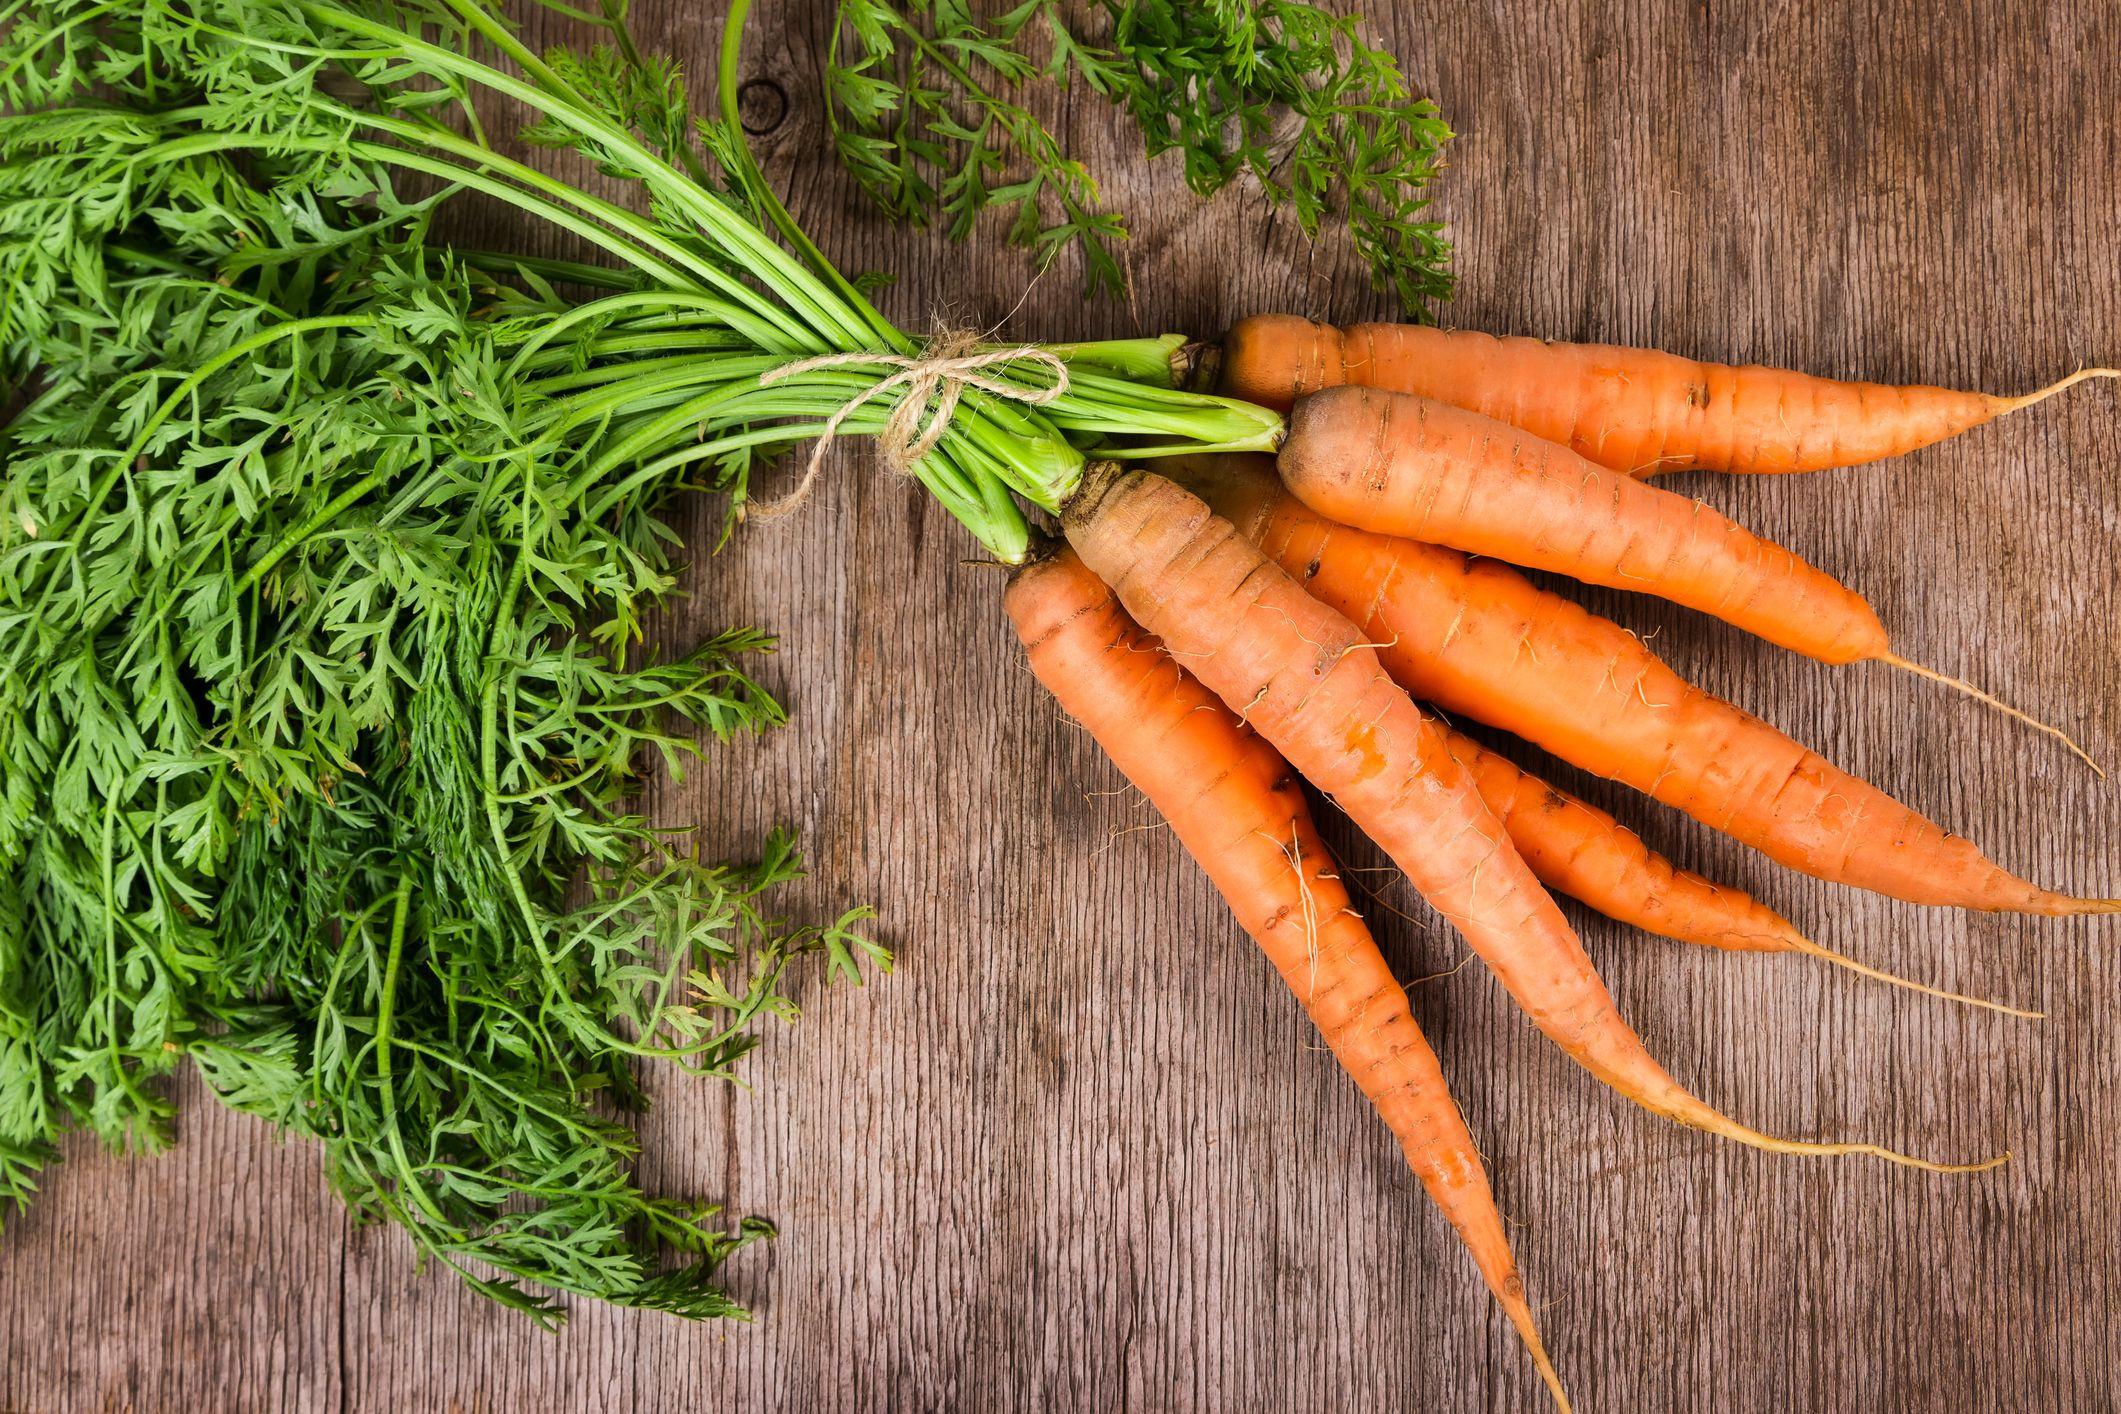 Bunch Carrots